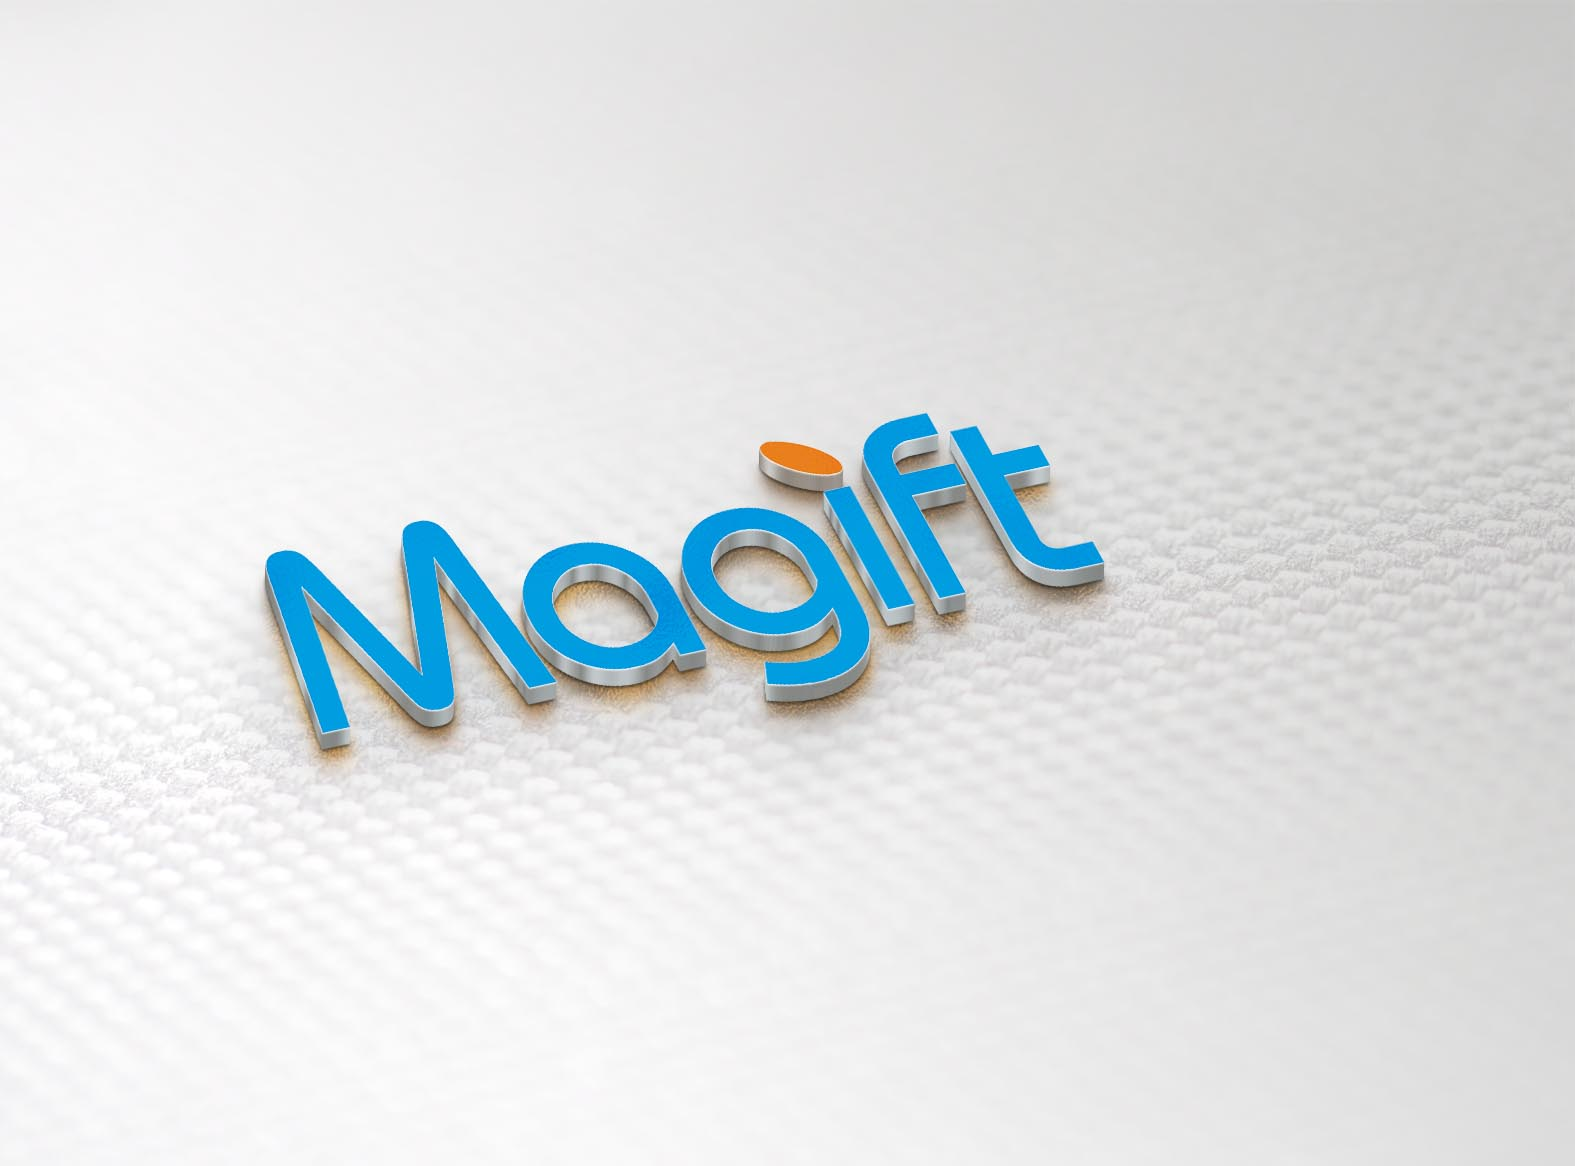 Magift蓝牙耳机品牌Logo设计_2943826_k68威客网